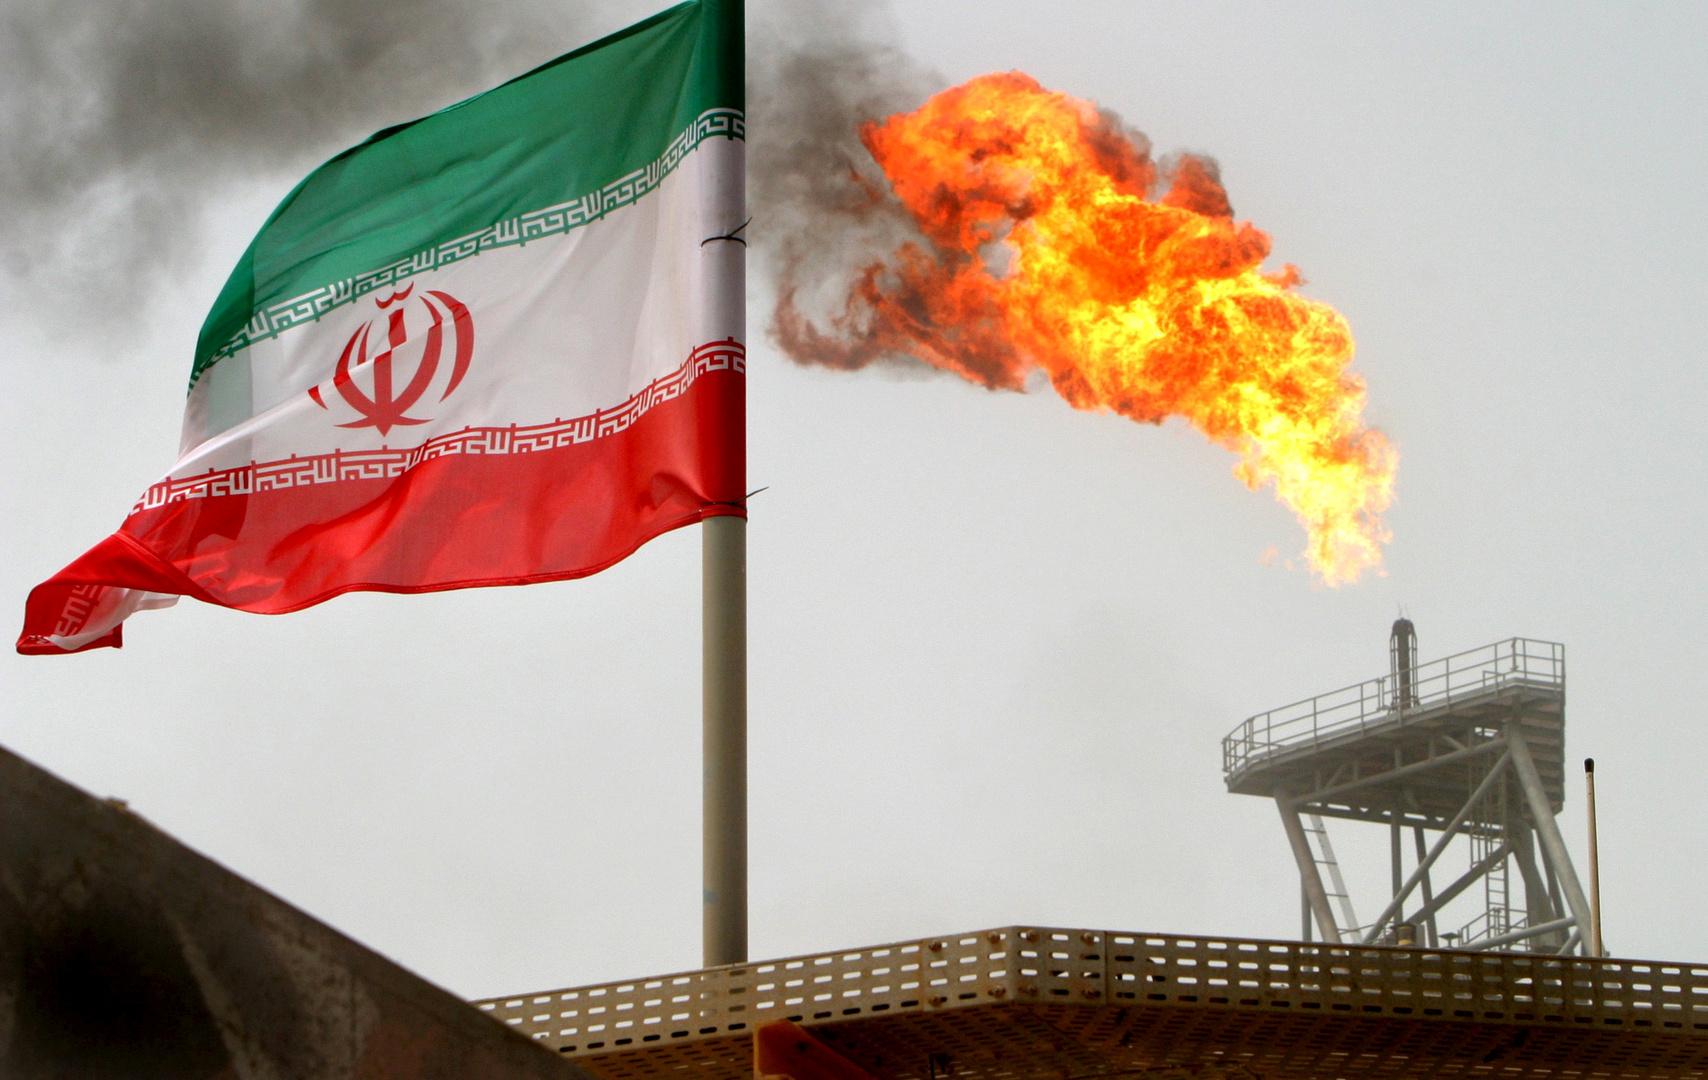 إيران تعلن ربحها دعوى قضائية ضد إحدى جاراتها